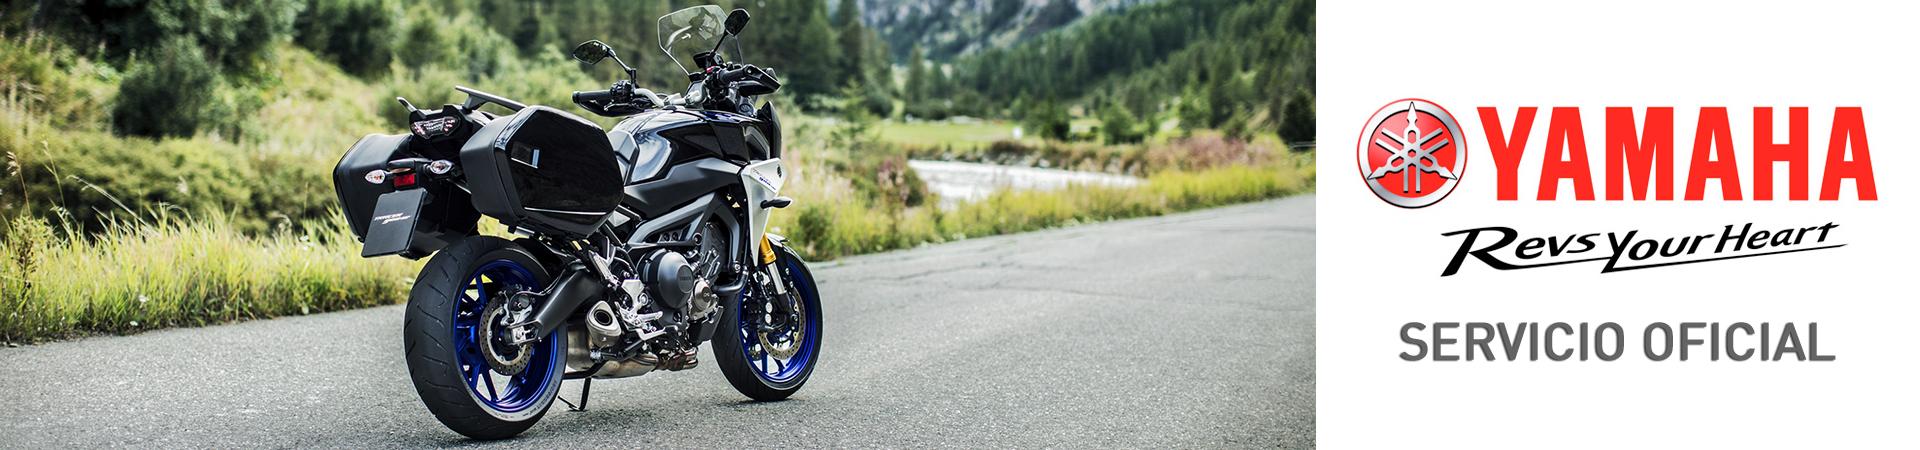 venta de motos en dos hermanas, taller de motos en montequinto